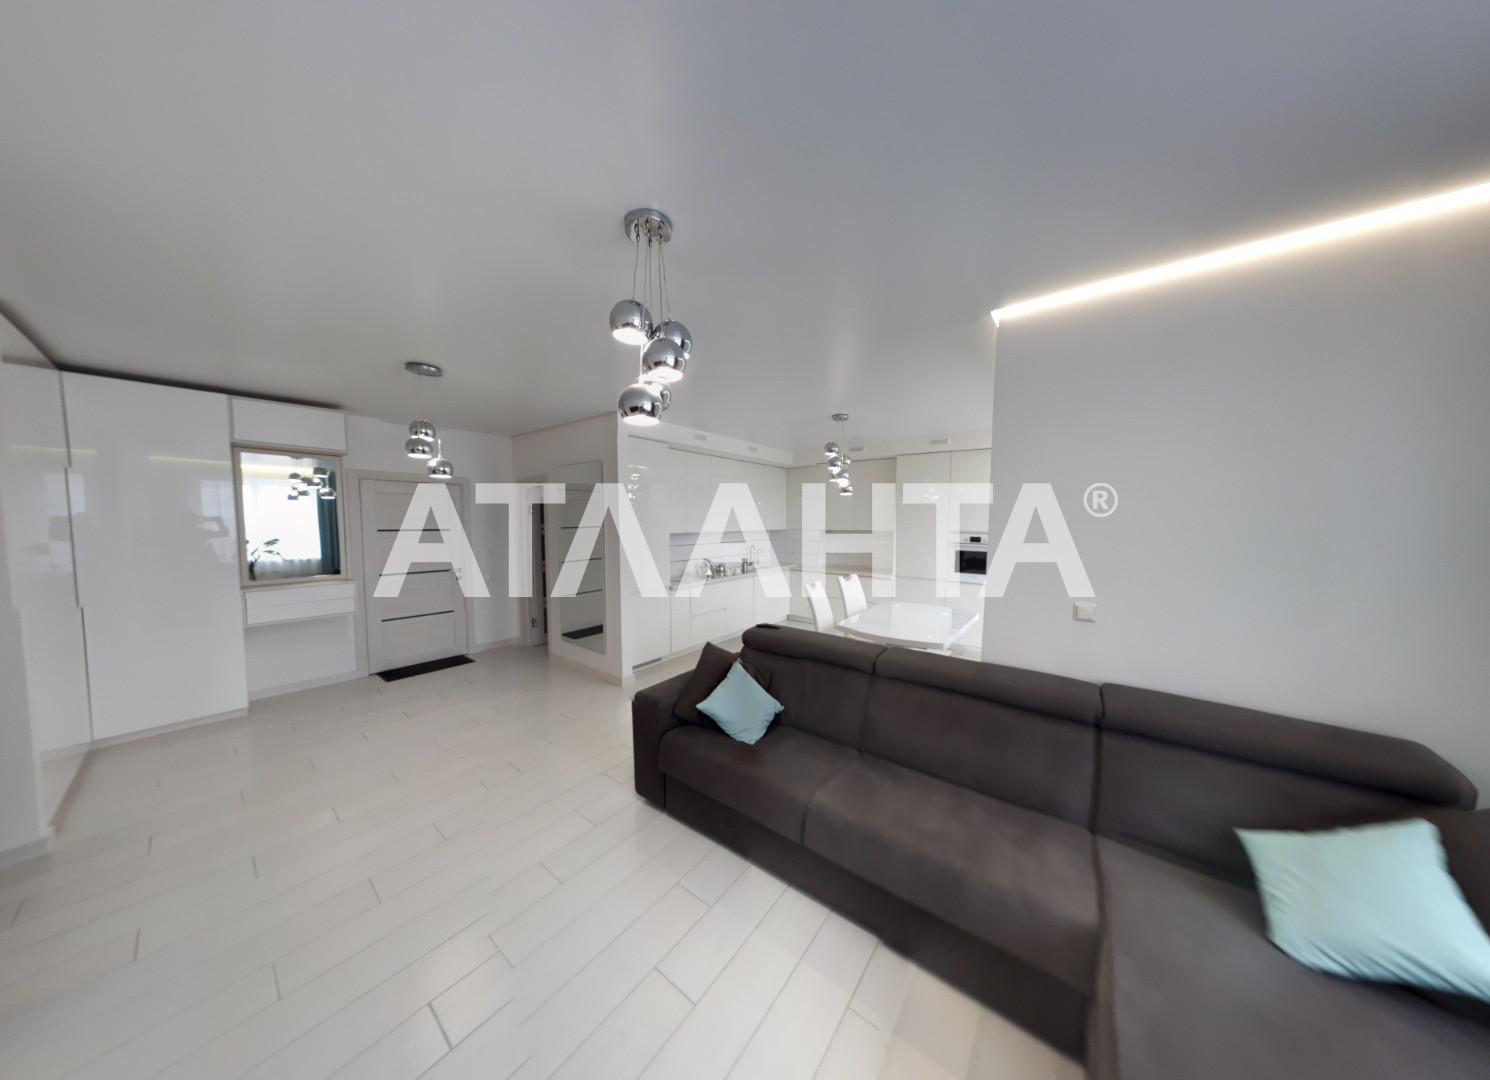 Продается 3-комнатная Квартира на ул. Просп. Глушкова — 160 000 у.е. (фото №7)